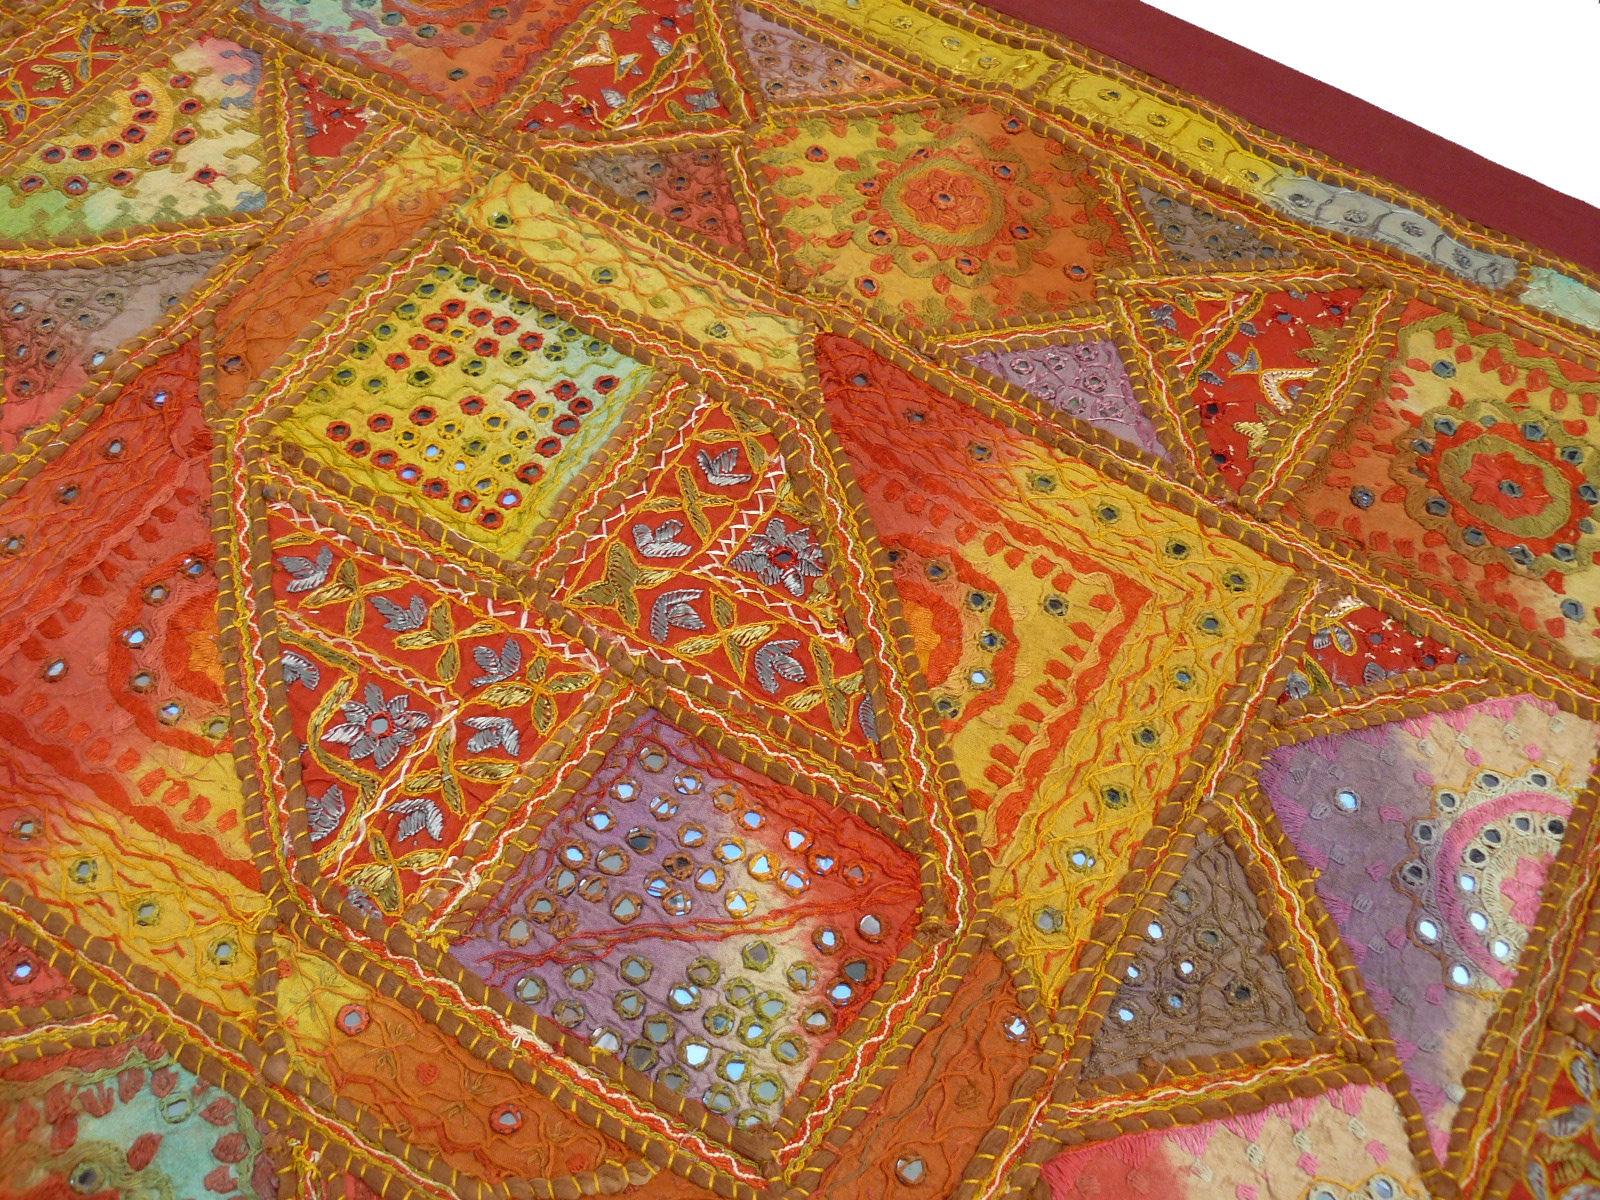 wandbehang wand teppich indien patchwork wand schmuck deko asien yoga hippie goa ebay. Black Bedroom Furniture Sets. Home Design Ideas